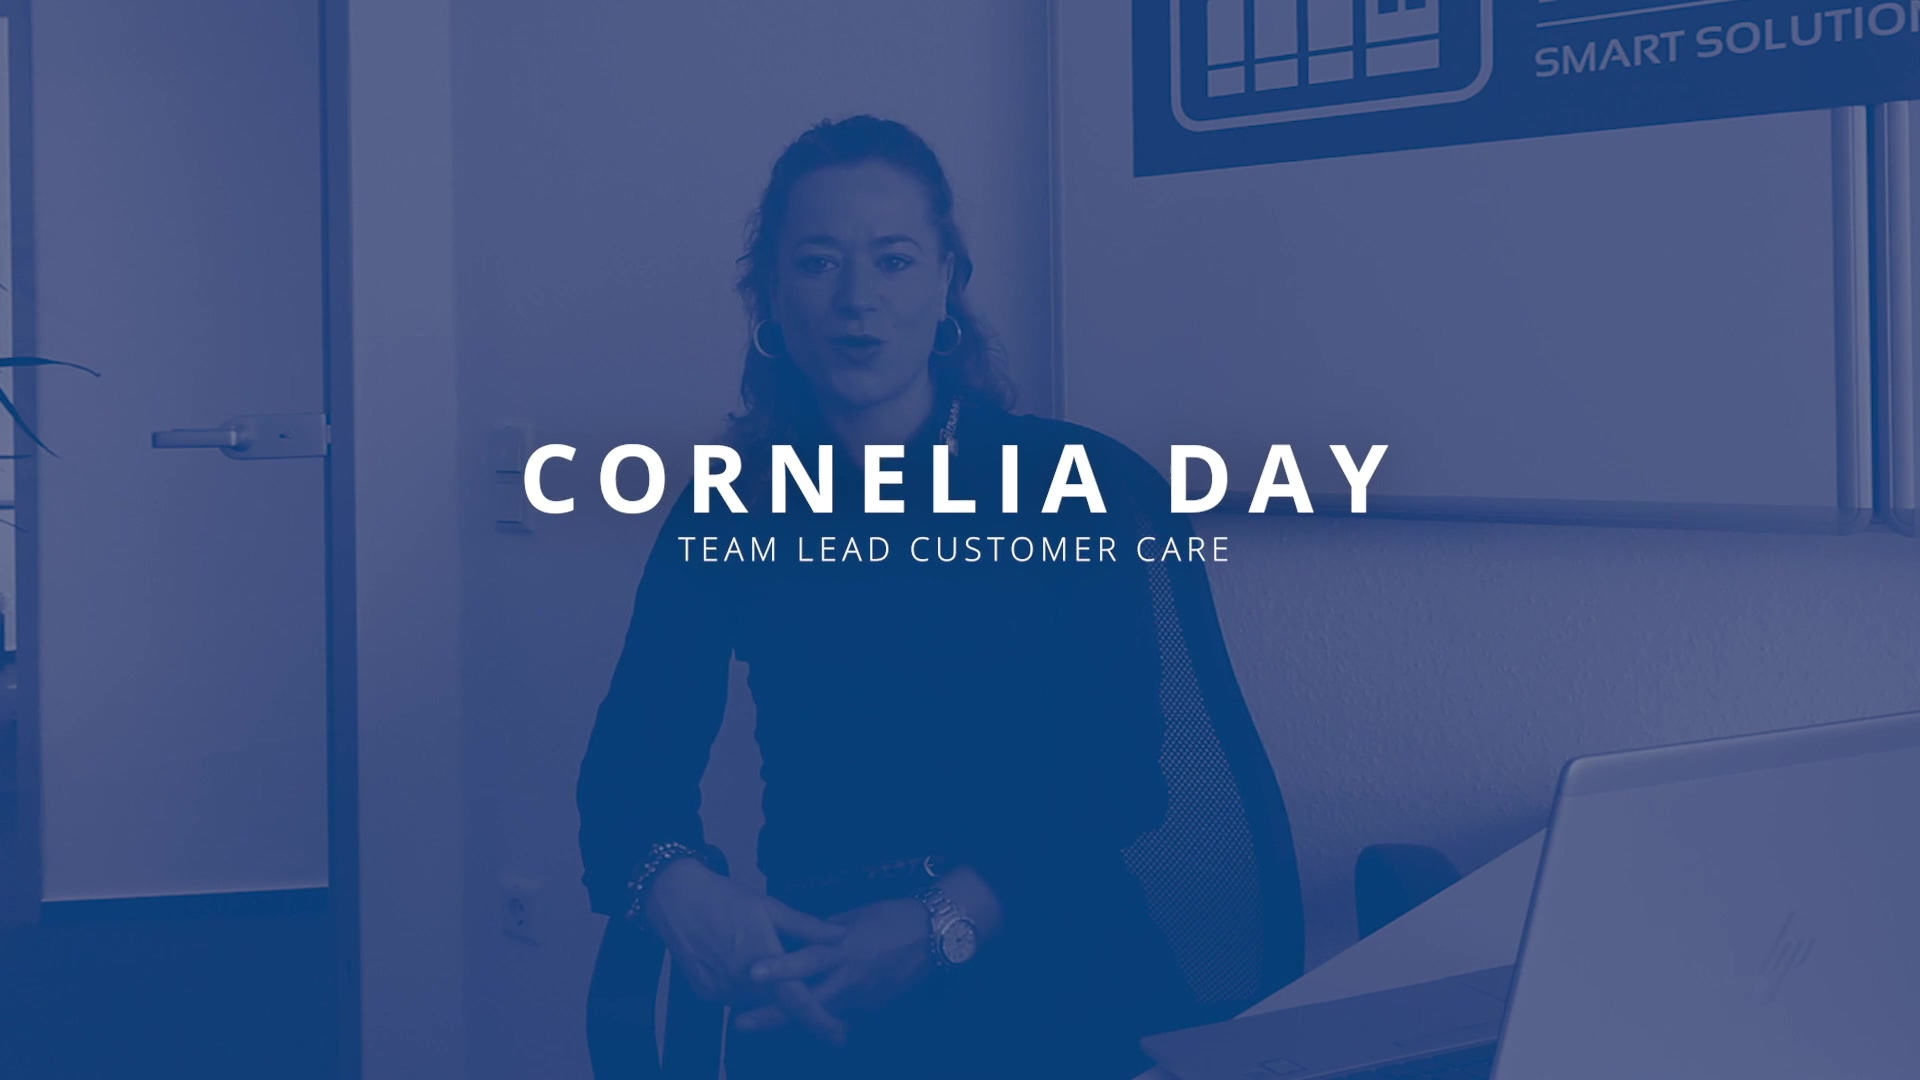 Cornelia Mitarbeiterinterview_finale2.0